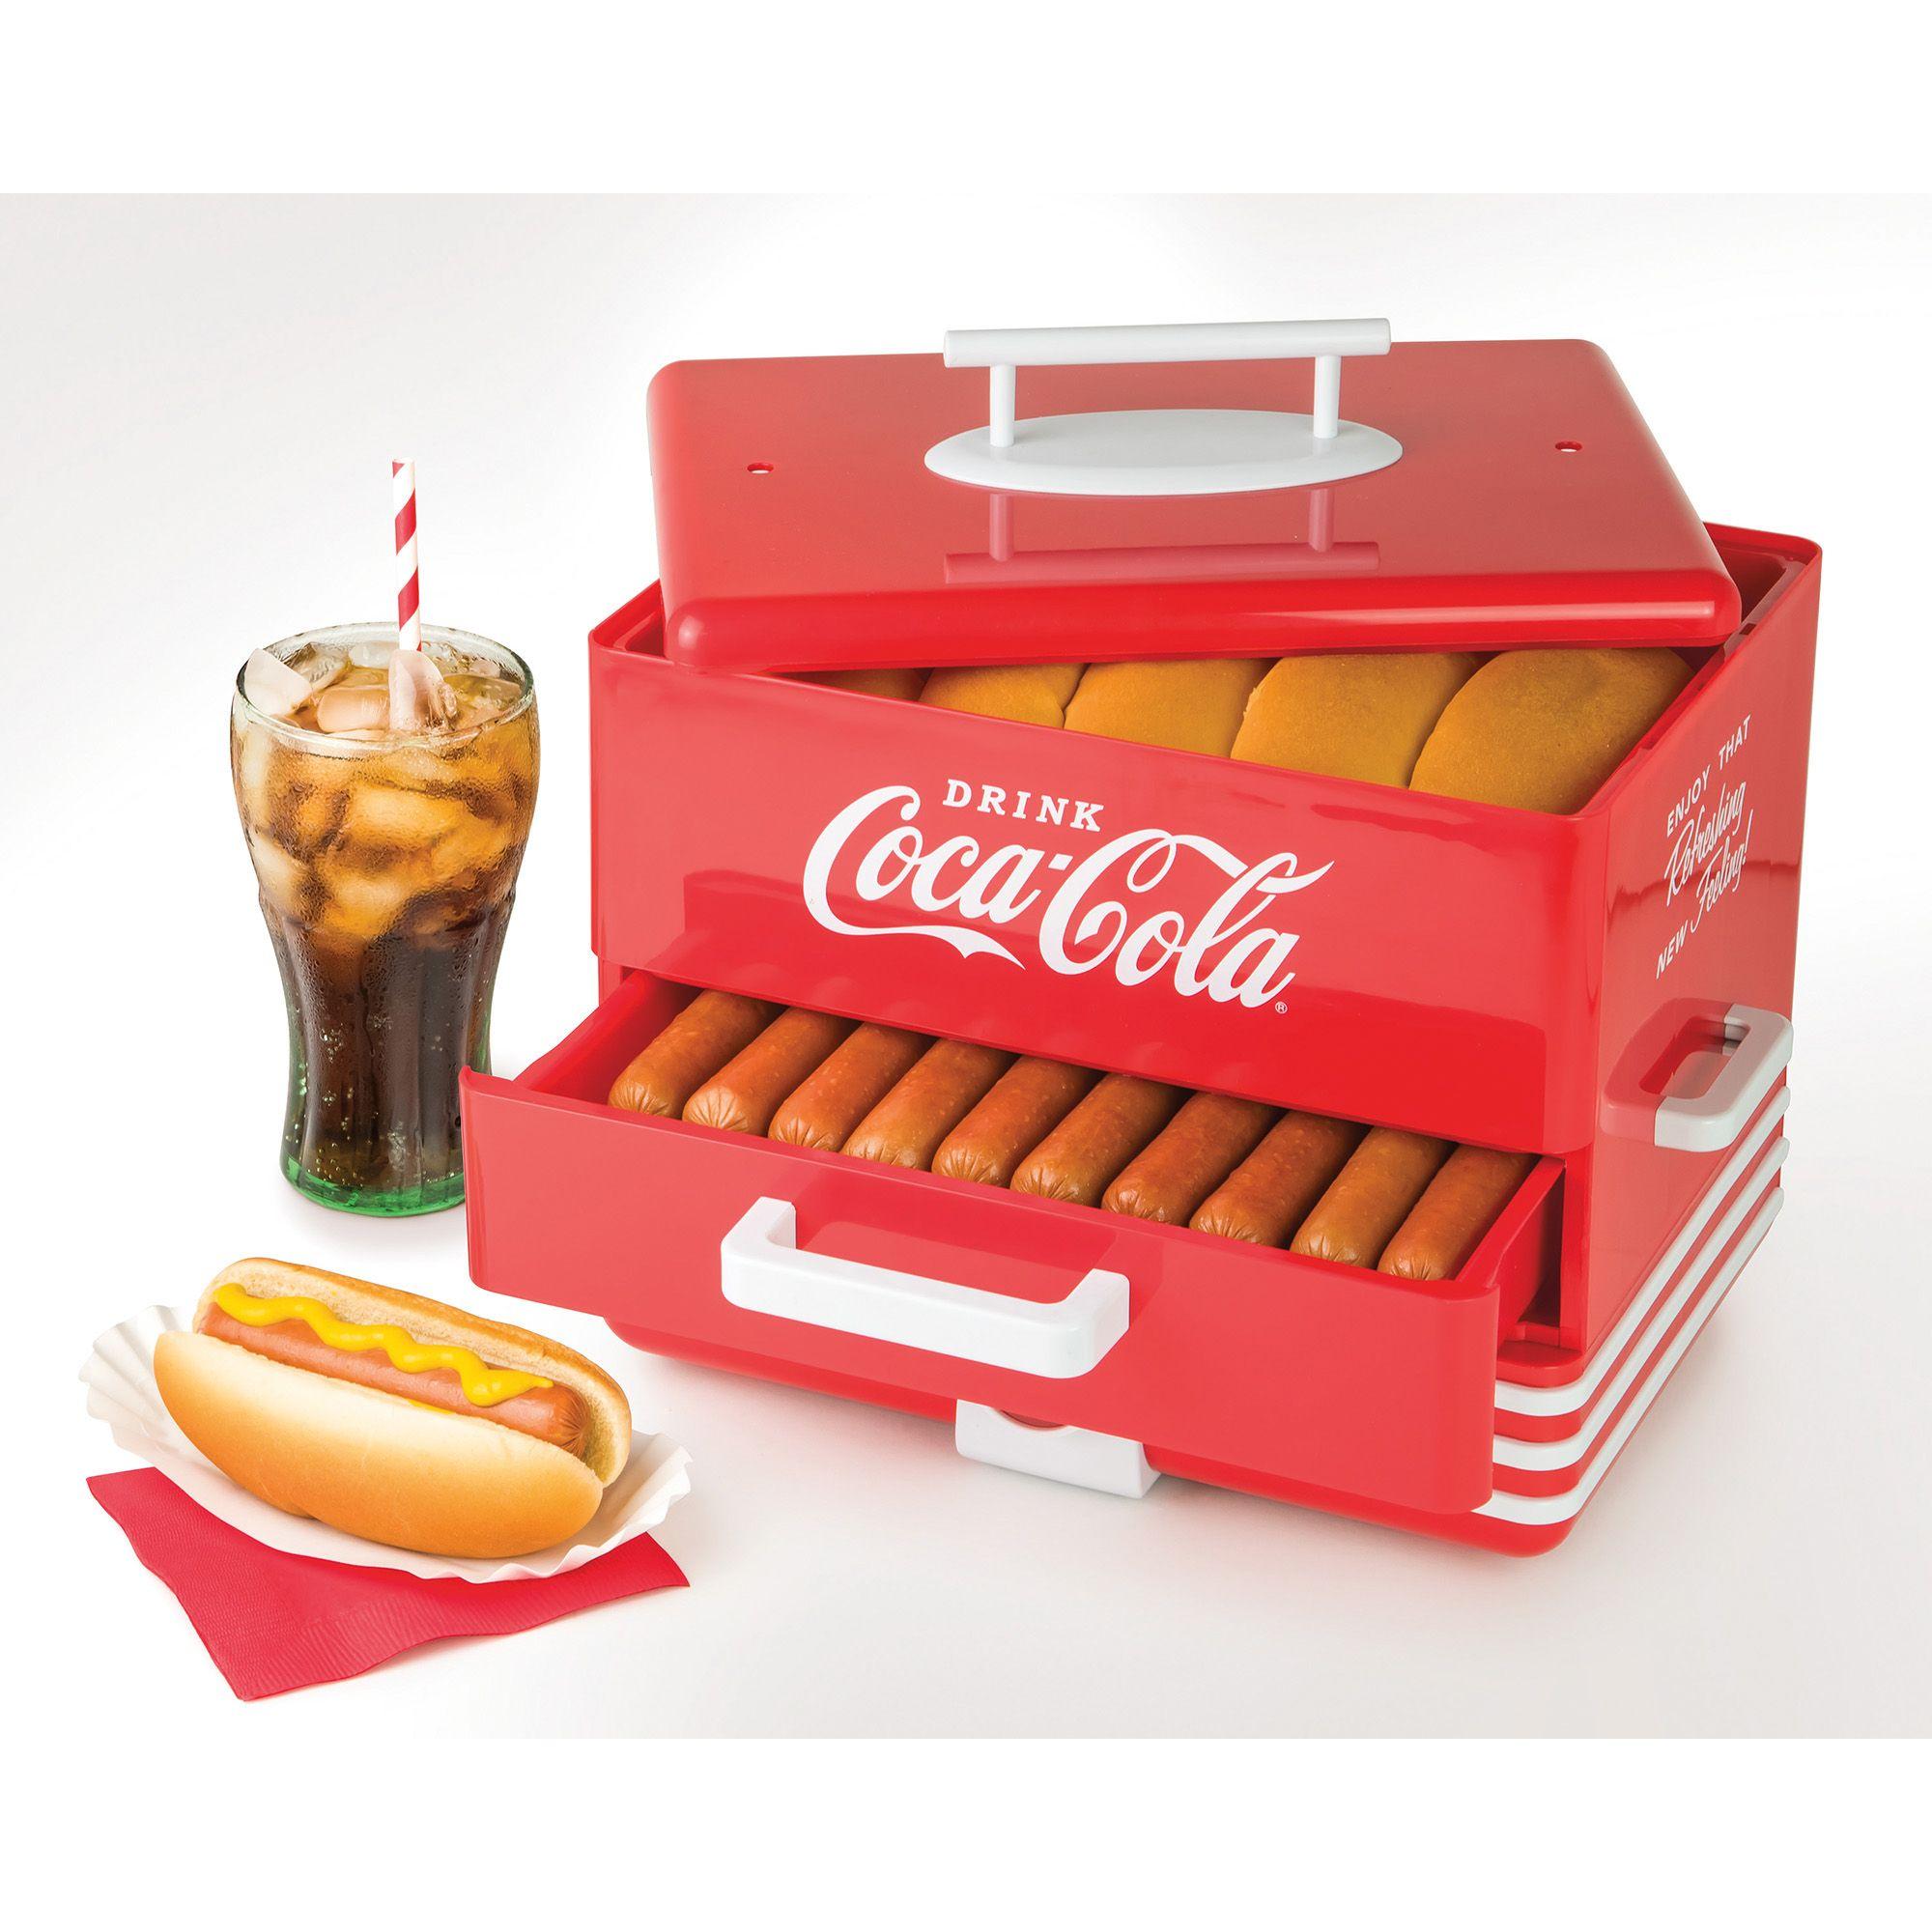 Coca-Cola® Hot Dog Steamer | coca cola siempre | Pinterest